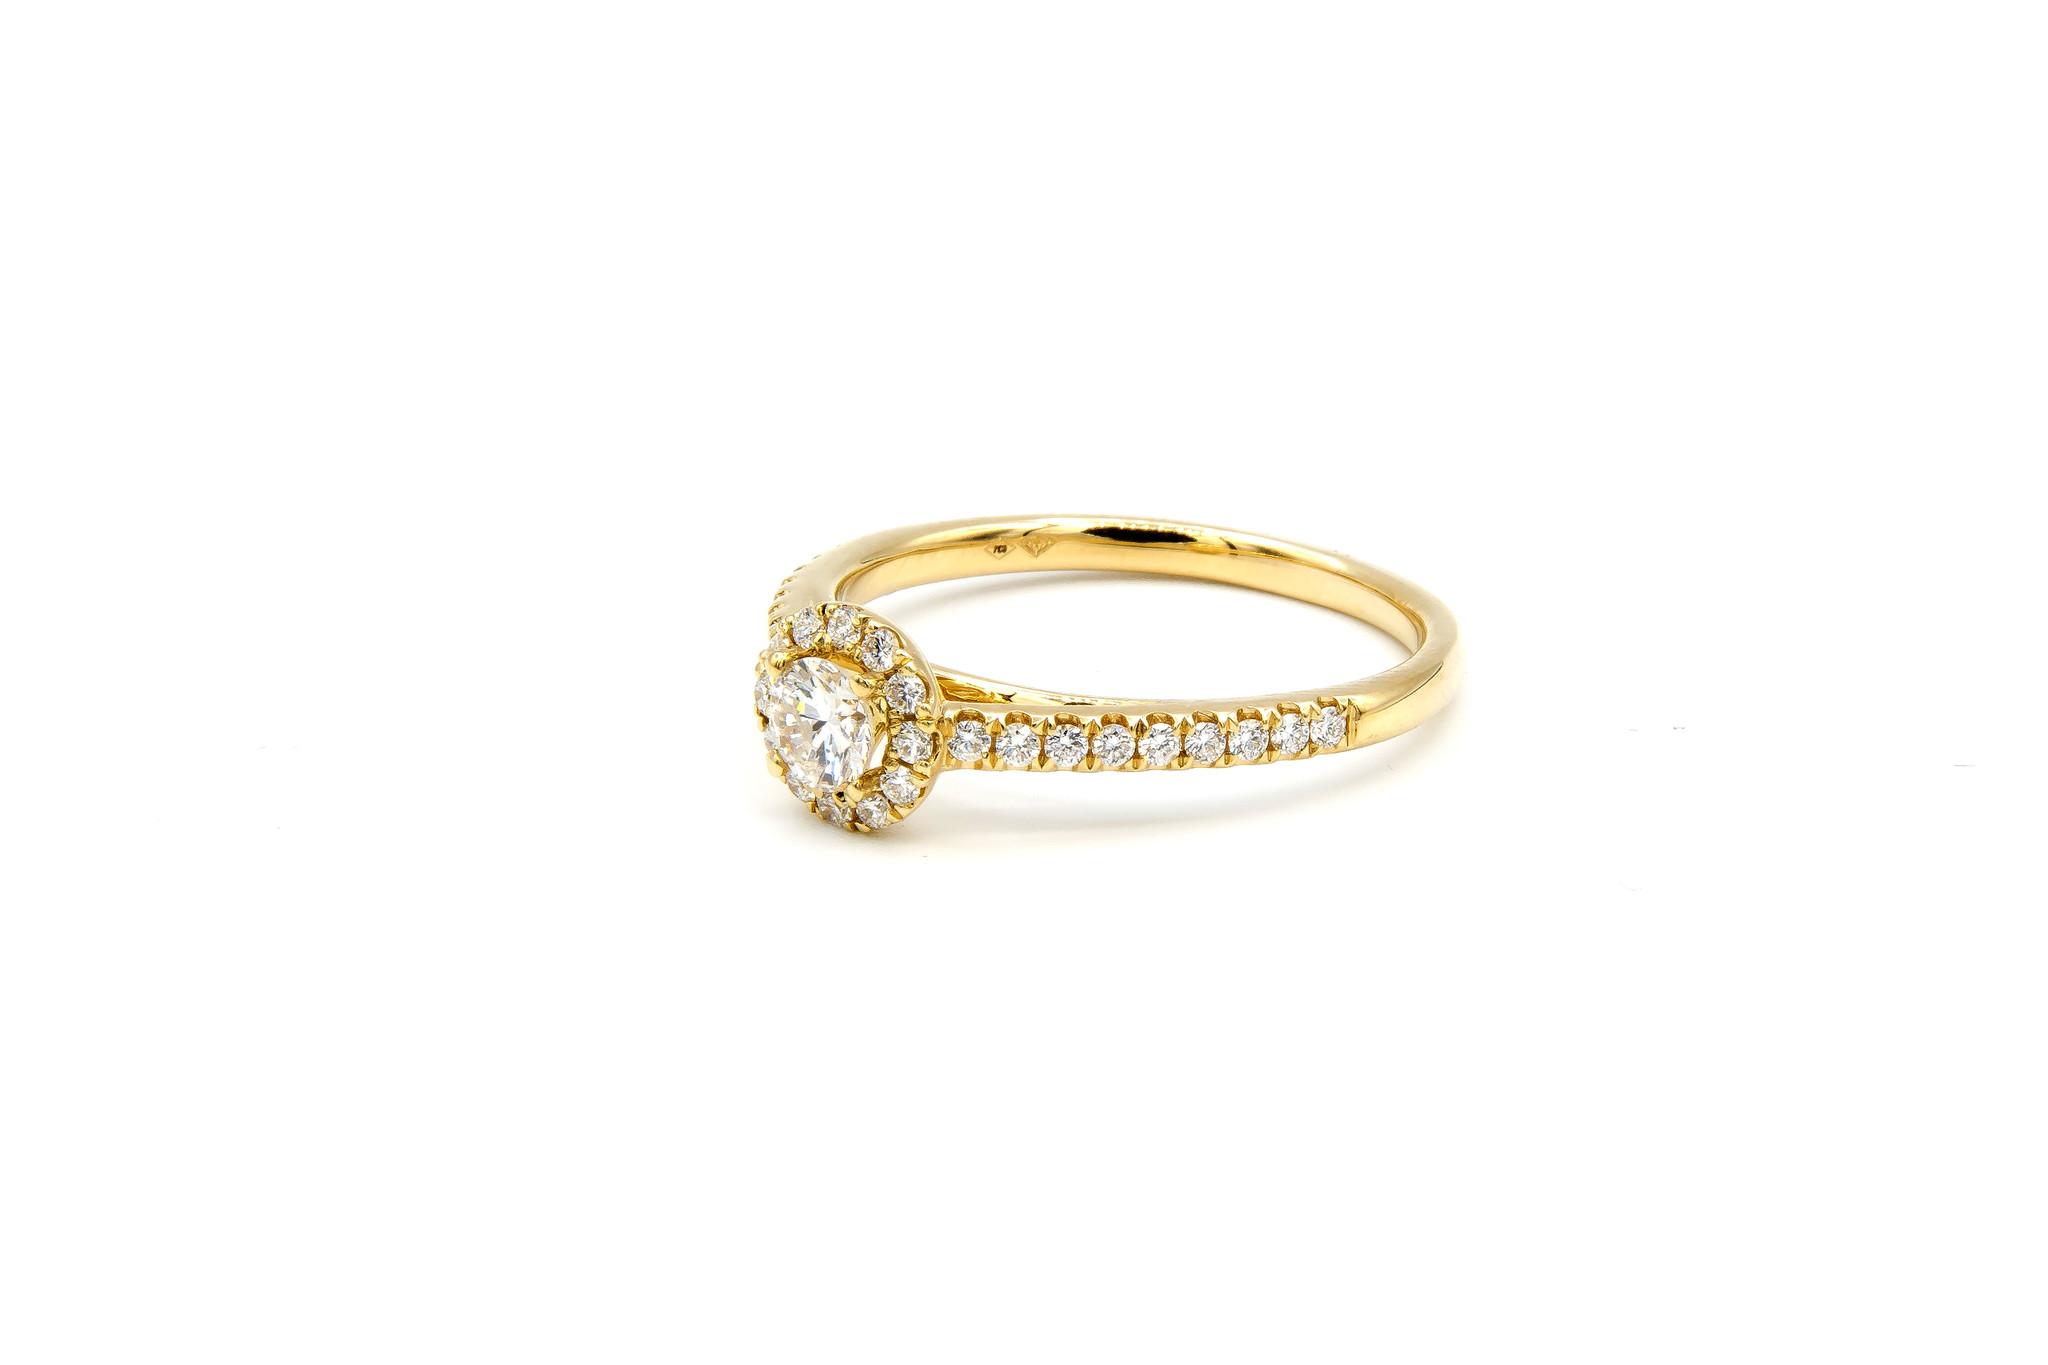 Ring verlovingsring met 0,3 ct VS en 0,26 ct VS diamant-3